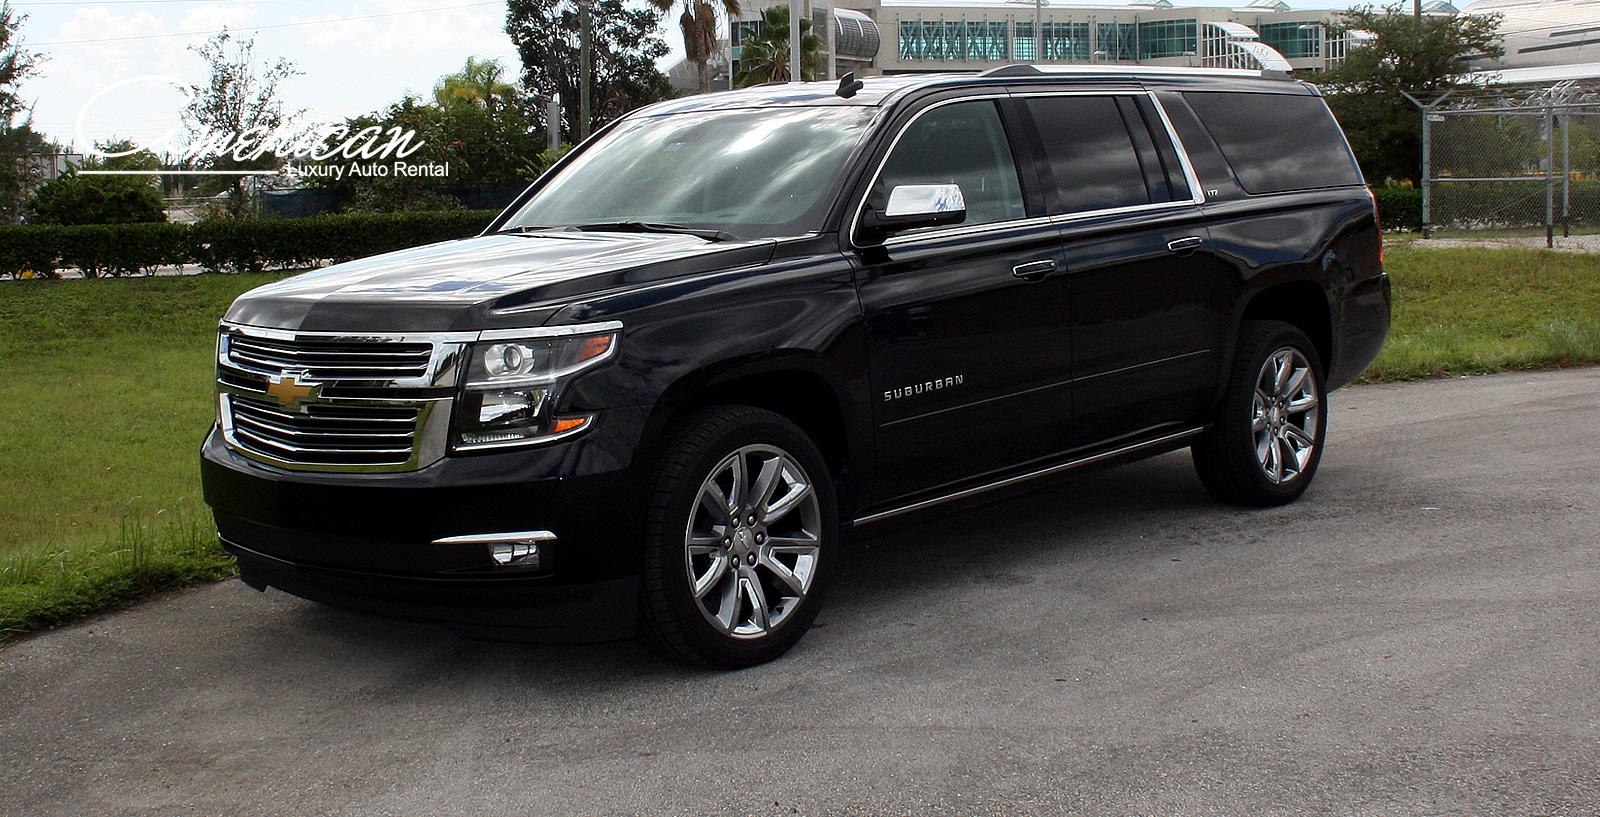 Chevrolet Suburban LTZ Rental in Orlando and Miami – American Luxury Auto Rental